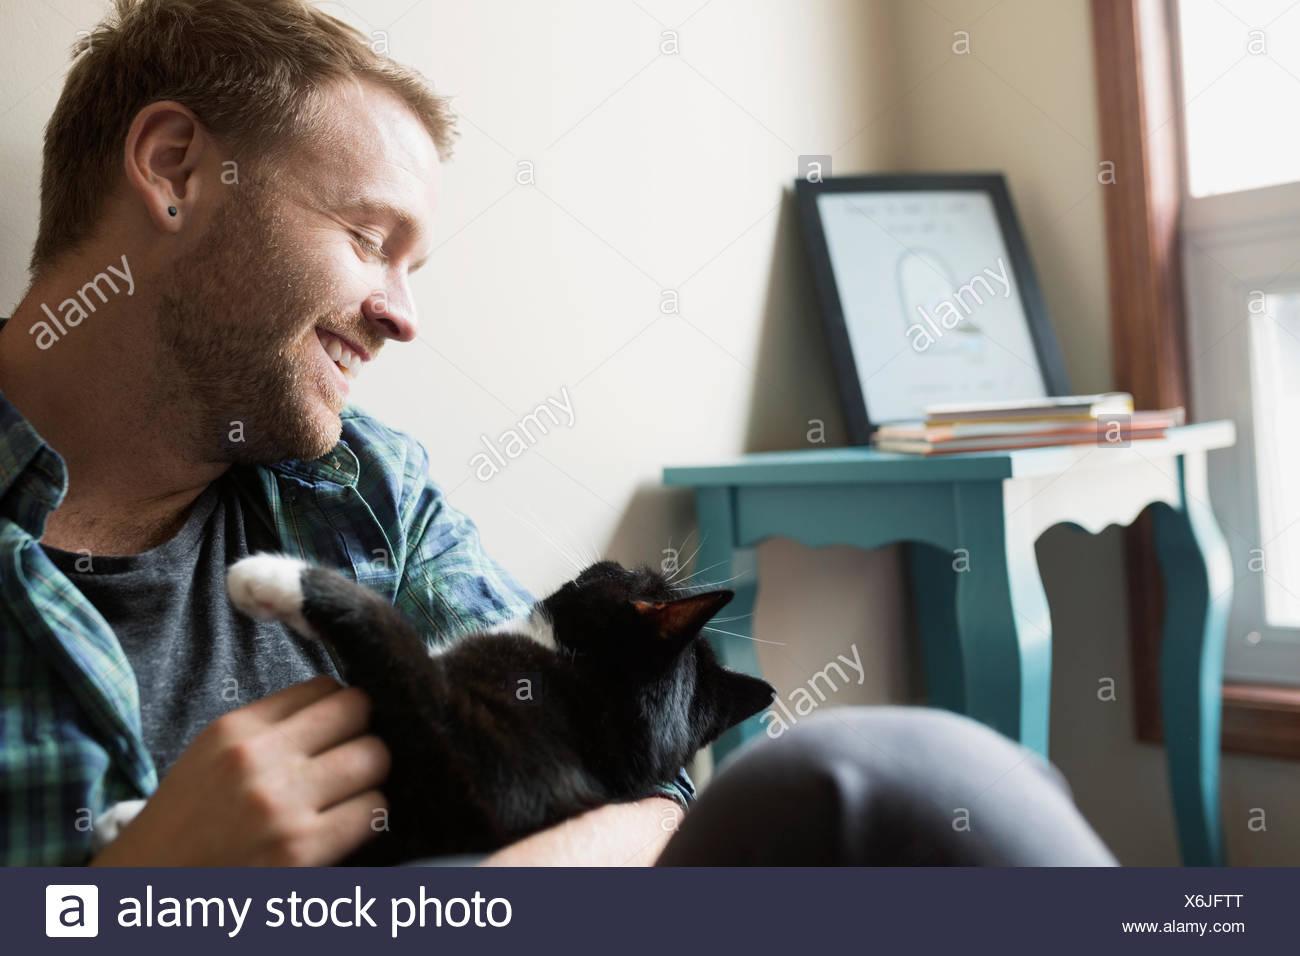 Affectionate man petting cat - Stock Image